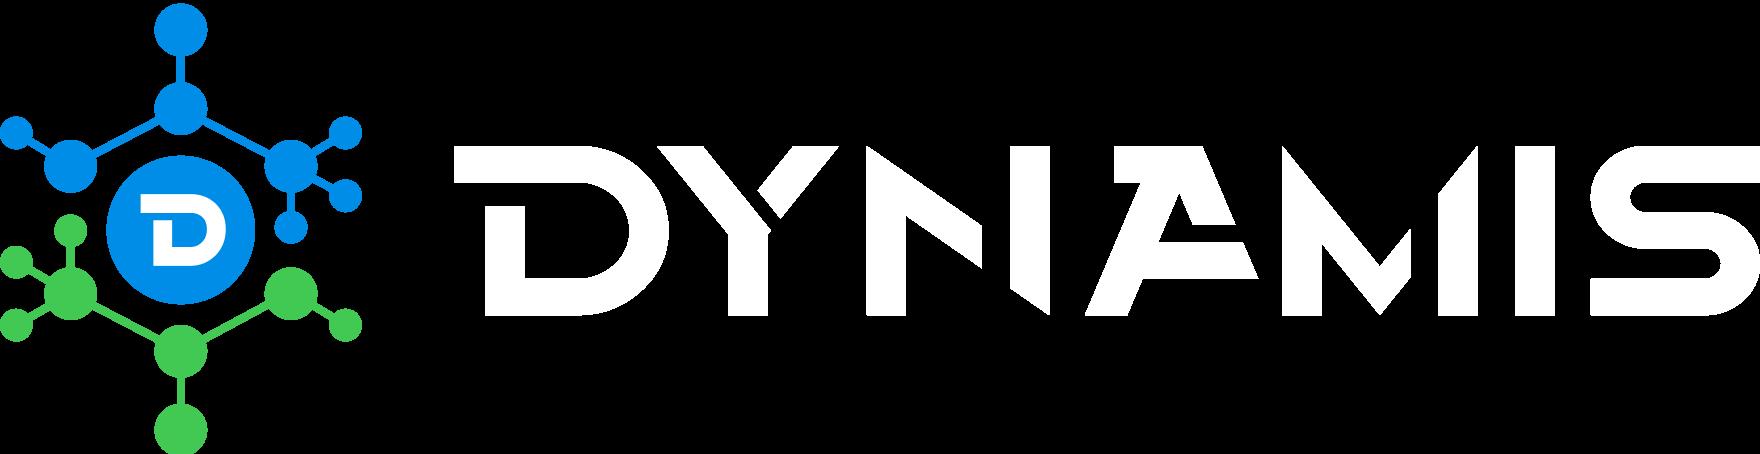 https://solidproof.io/storage/logos/pd4GEBKNidrDXtts8LkpJKxvGsIrfONG1tF08gew.png